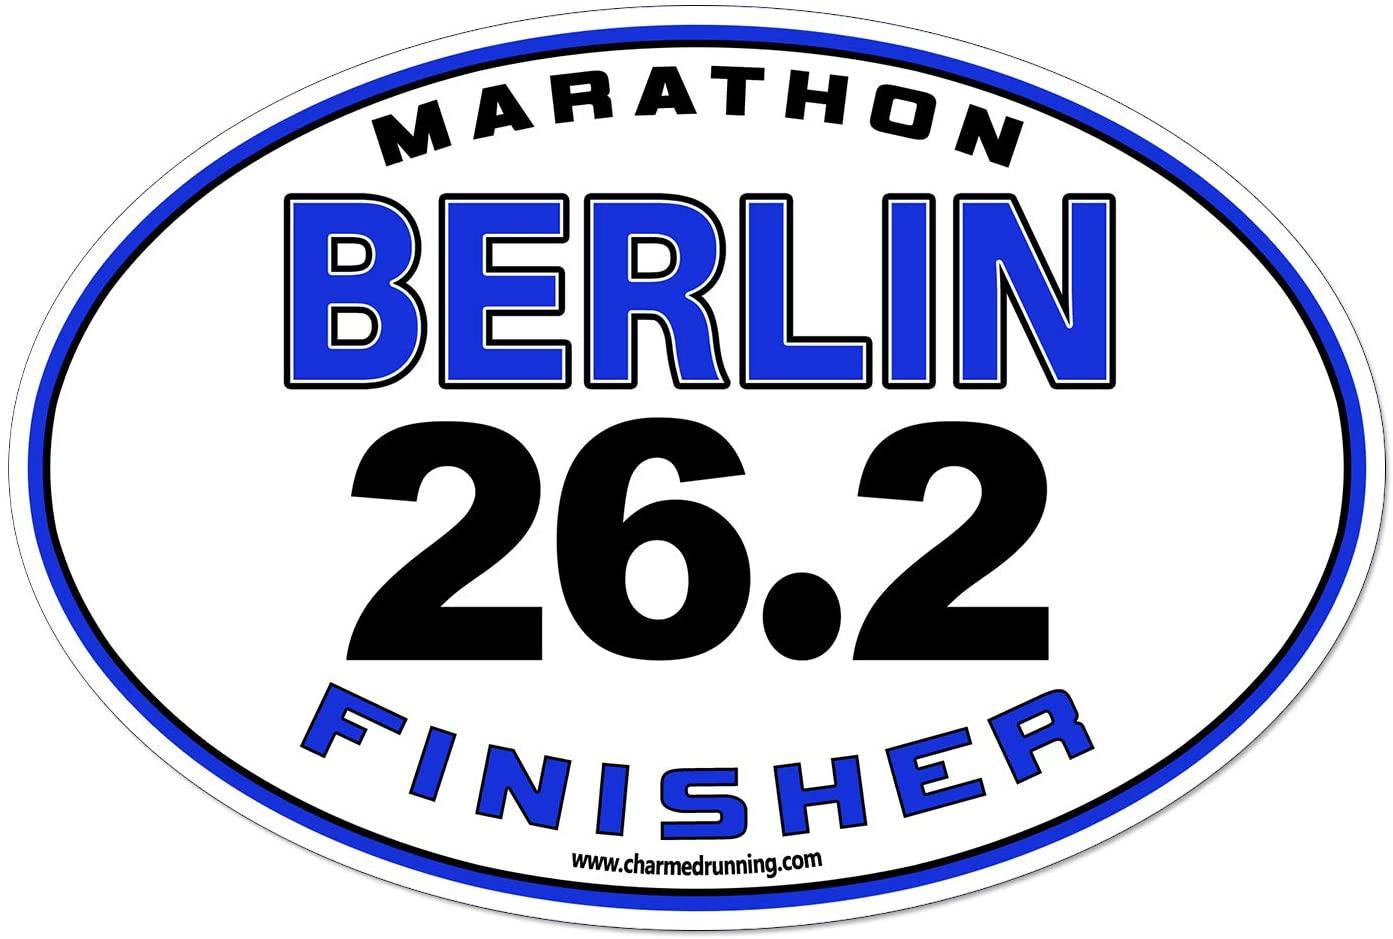 Charmed Running Berlin Germany Marathon Finisher 26.2 Car Magnet